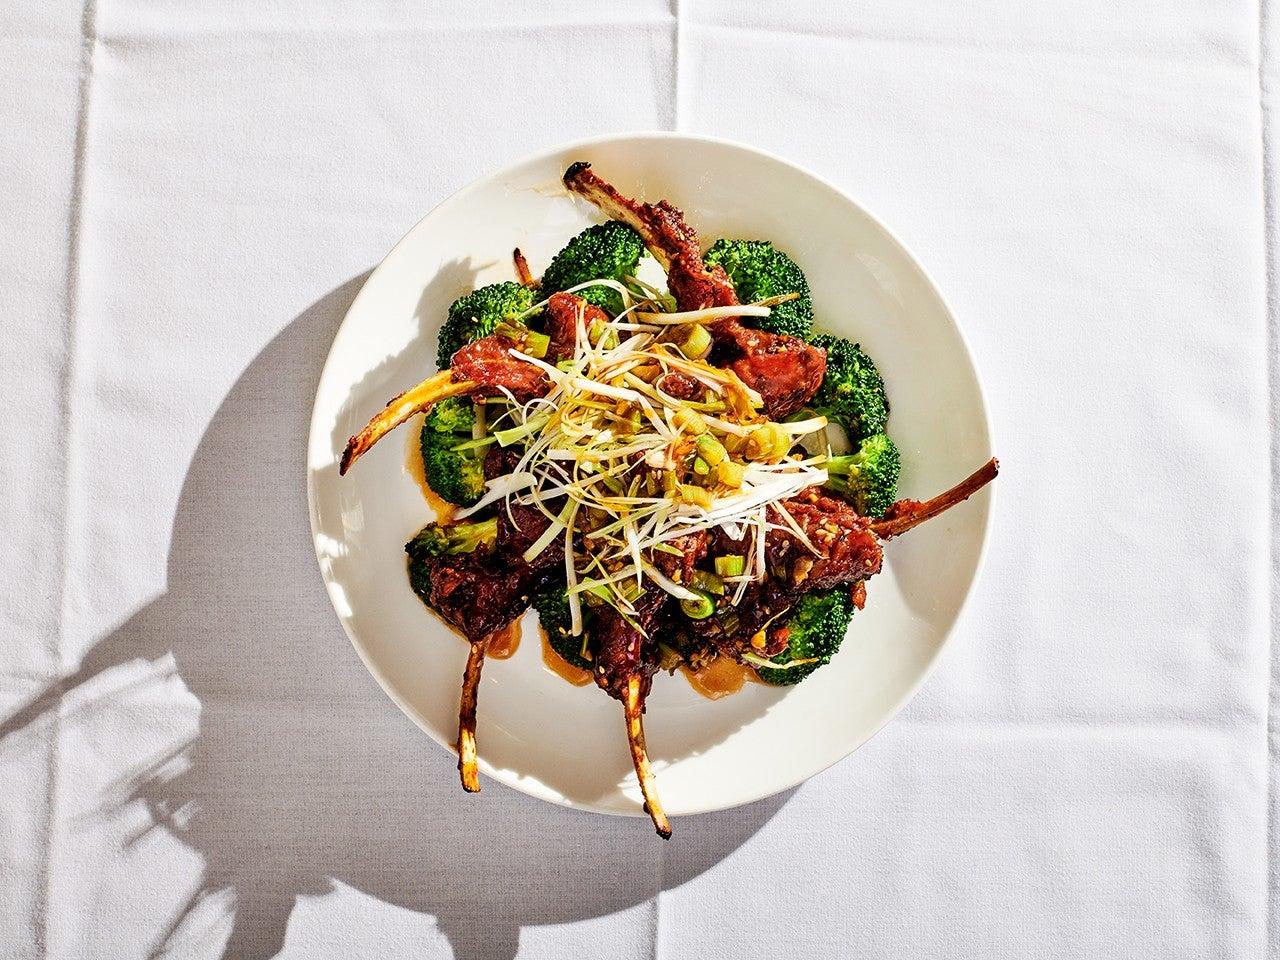 Lamb Chops Peking-Style On top of Broccoli